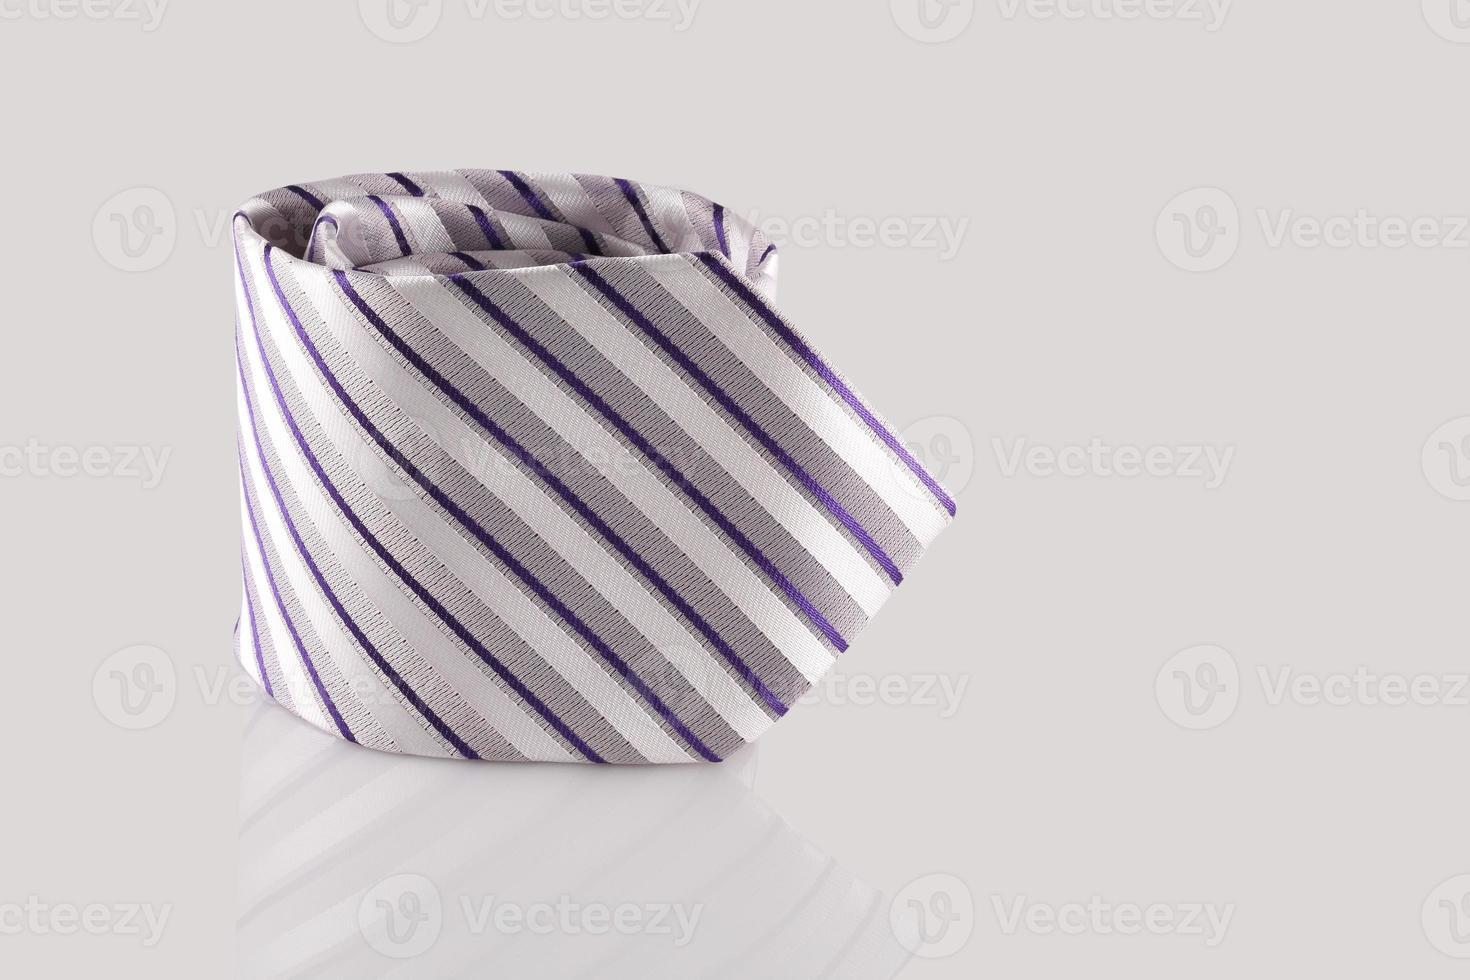 cravate bouchent photo